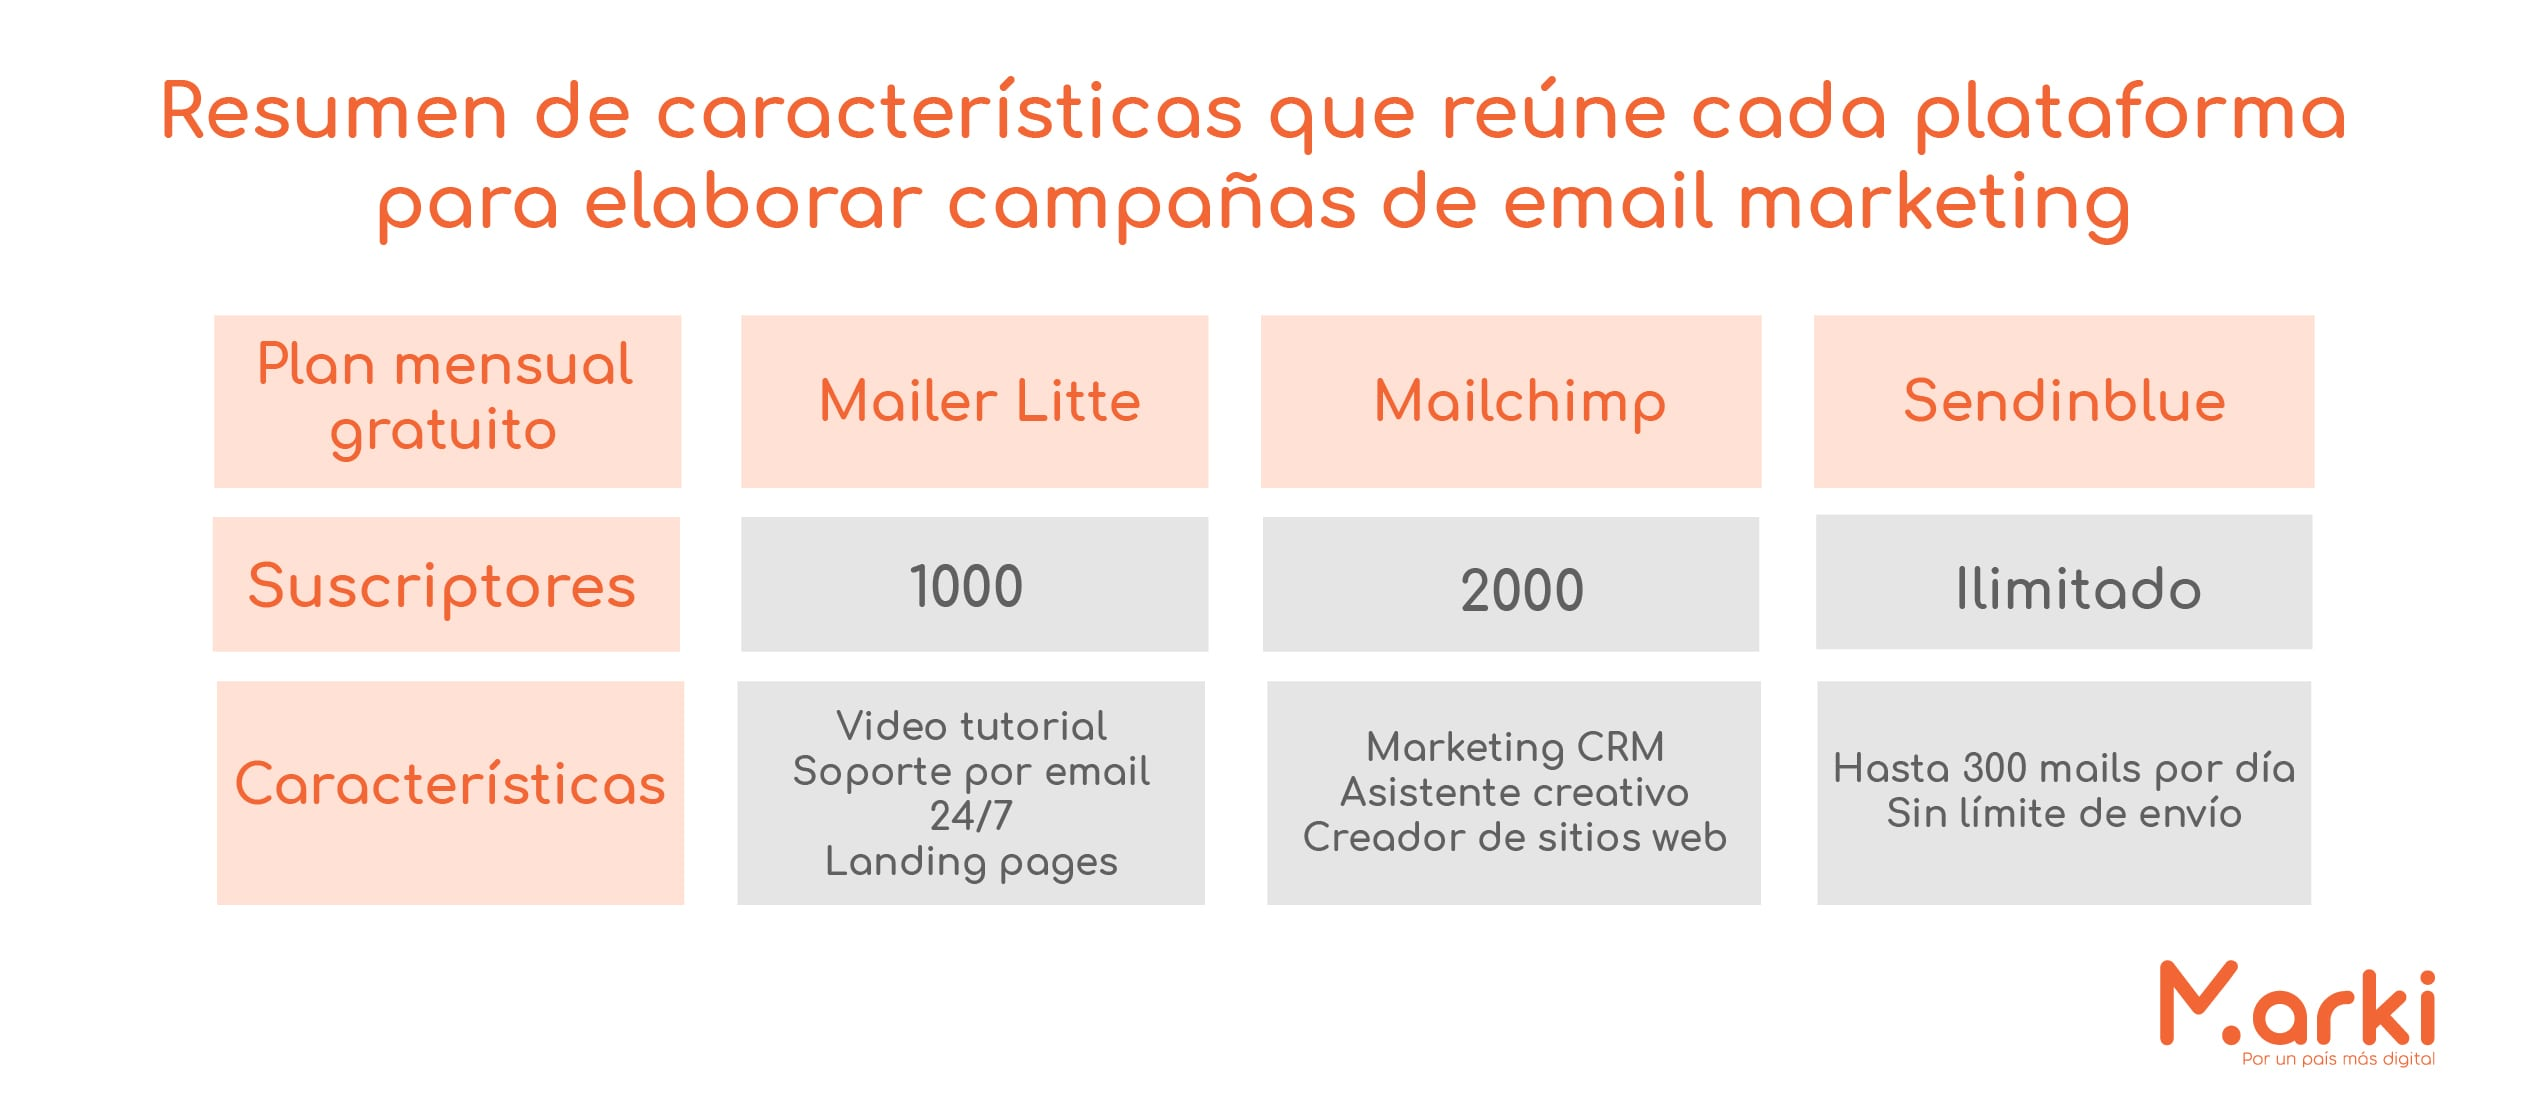 herramientas de email marketing mailer lite mailchimp como hacer email marketing gratis sendinblue campañas de mailing estrategias de email marketing ¿Cúal es la mejor herramienta de email marketing? diseño marki voluntariado marki